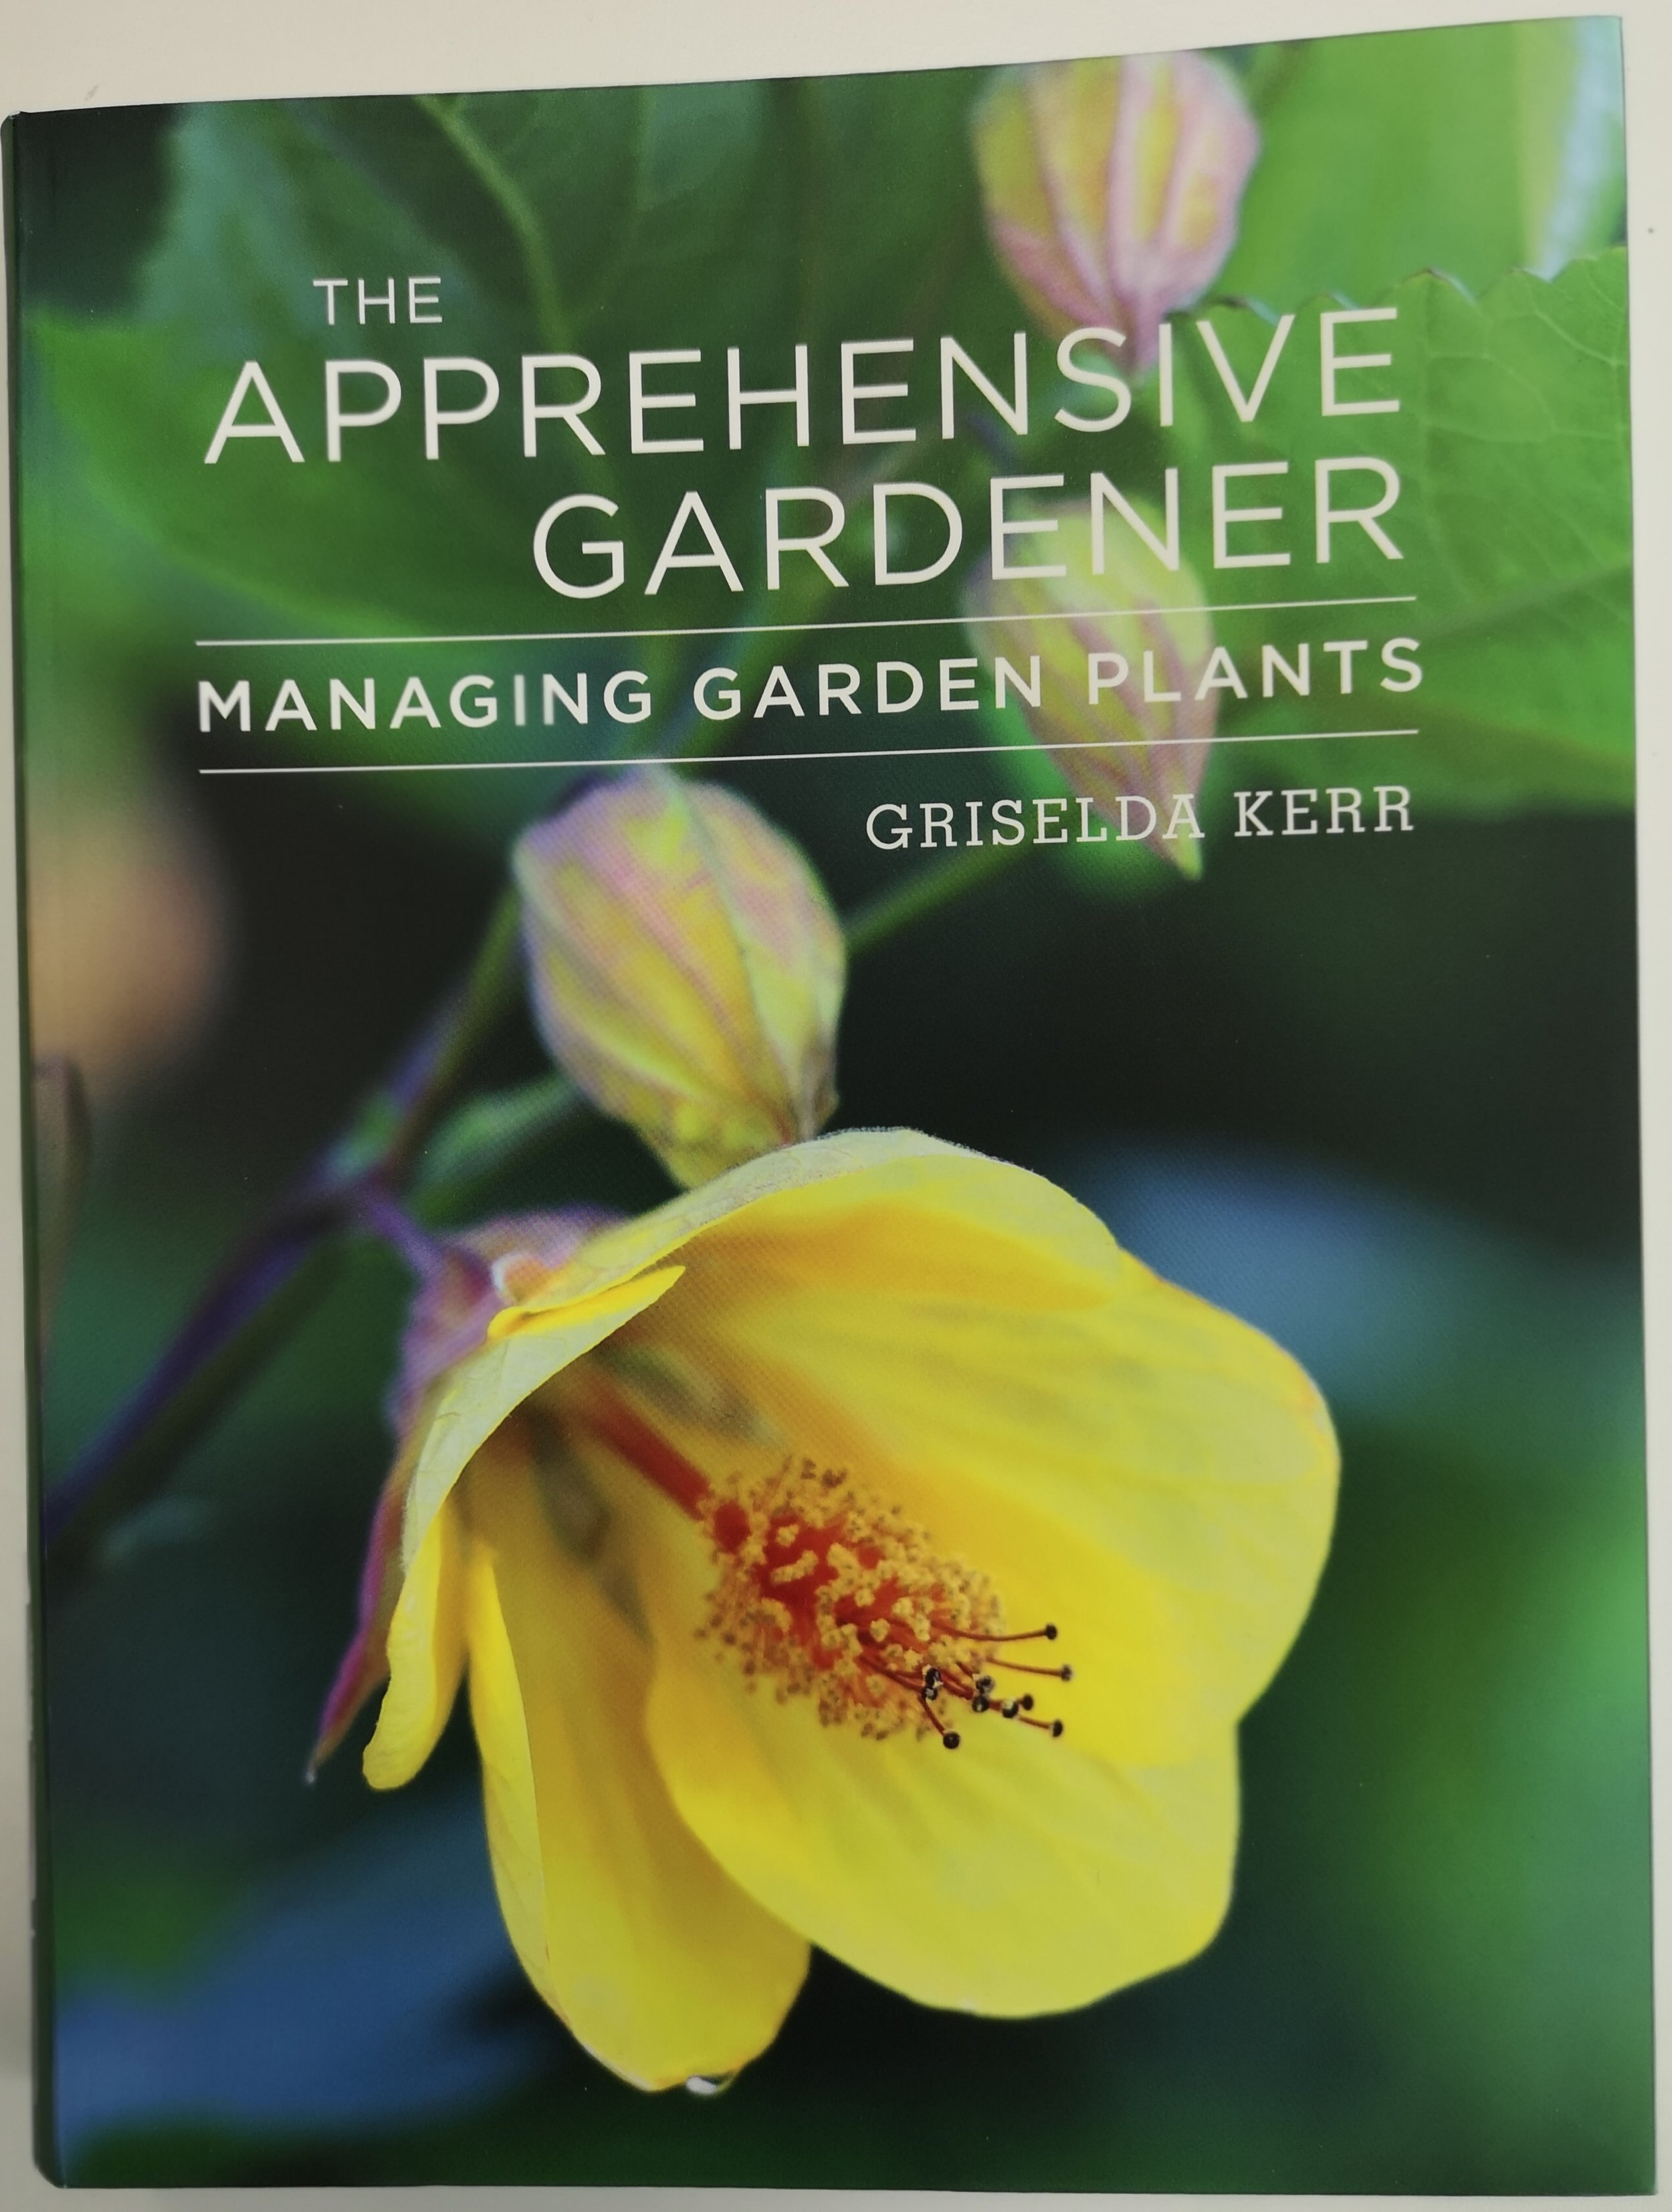 Griselda Kerr: The Apprehensive Gardener